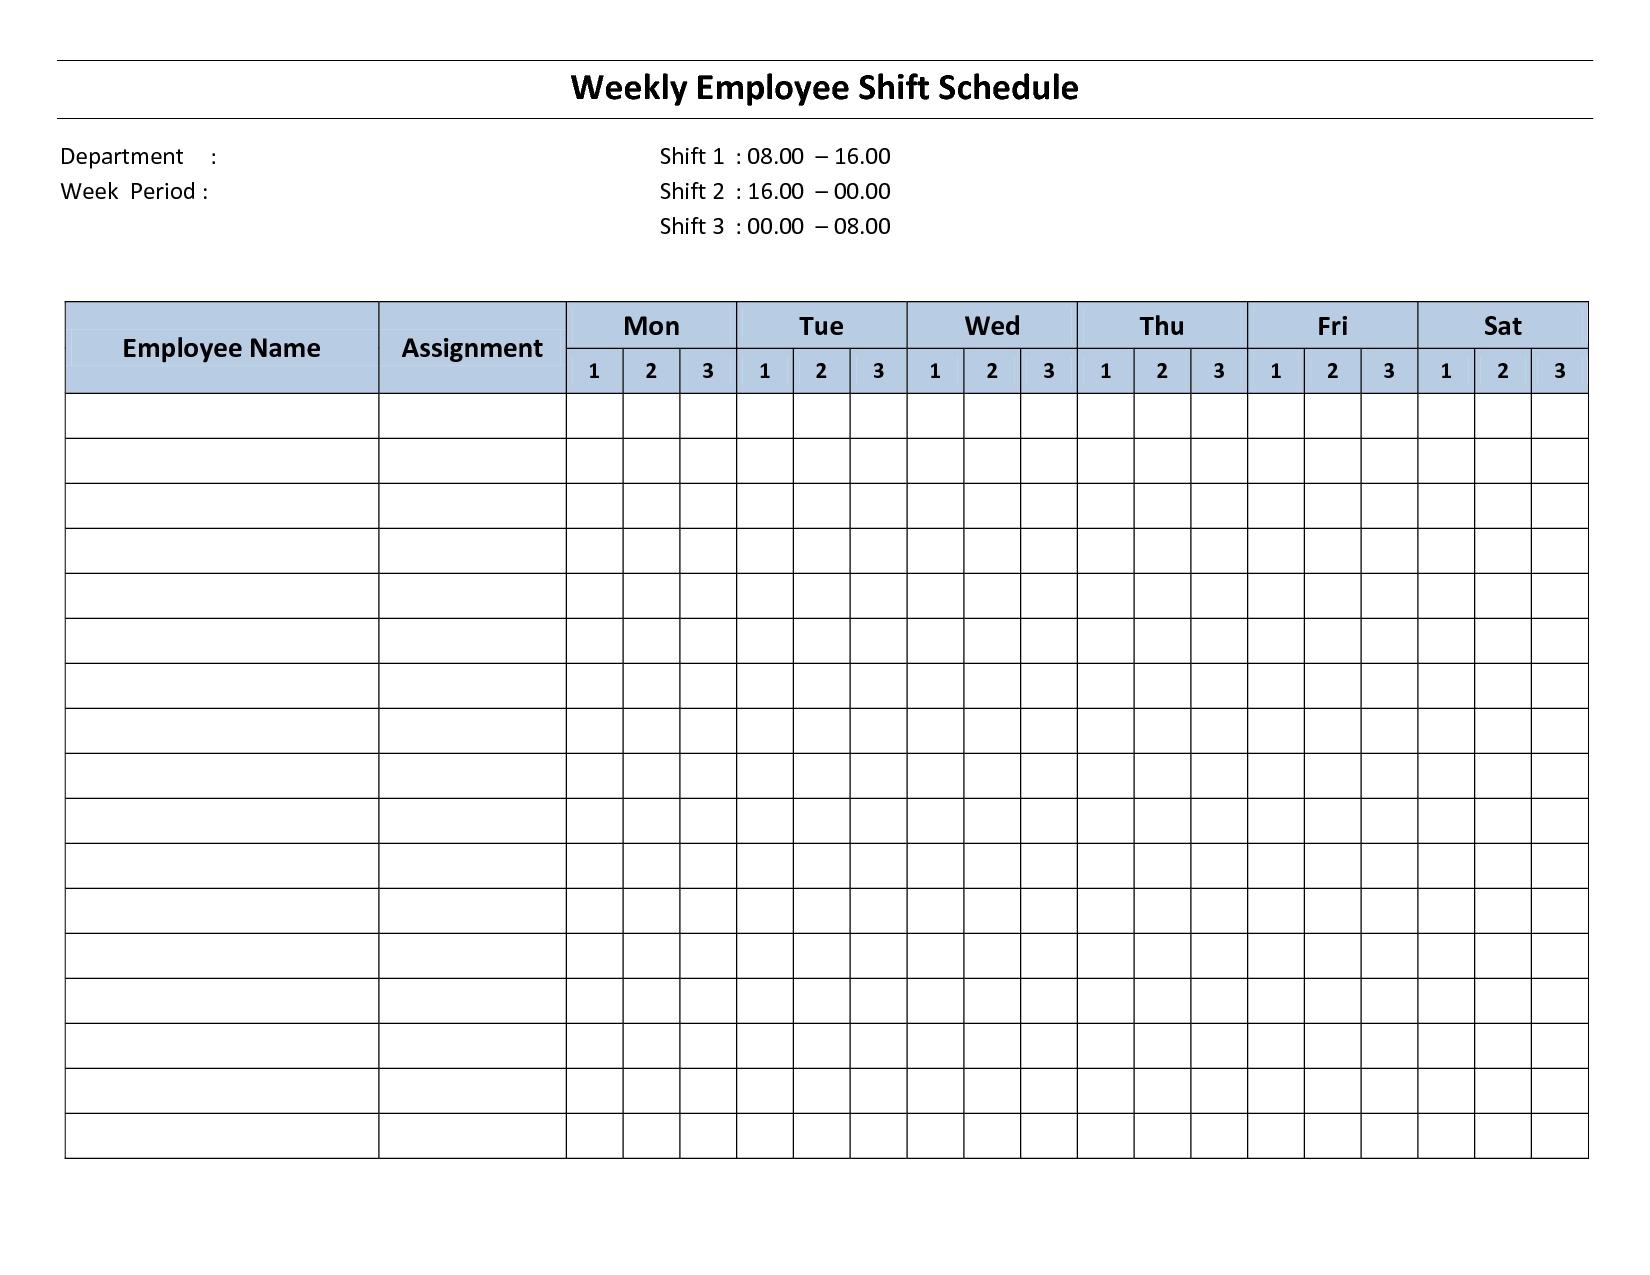 Free Printable Employee Work Schedules | Weekly Employee Shift